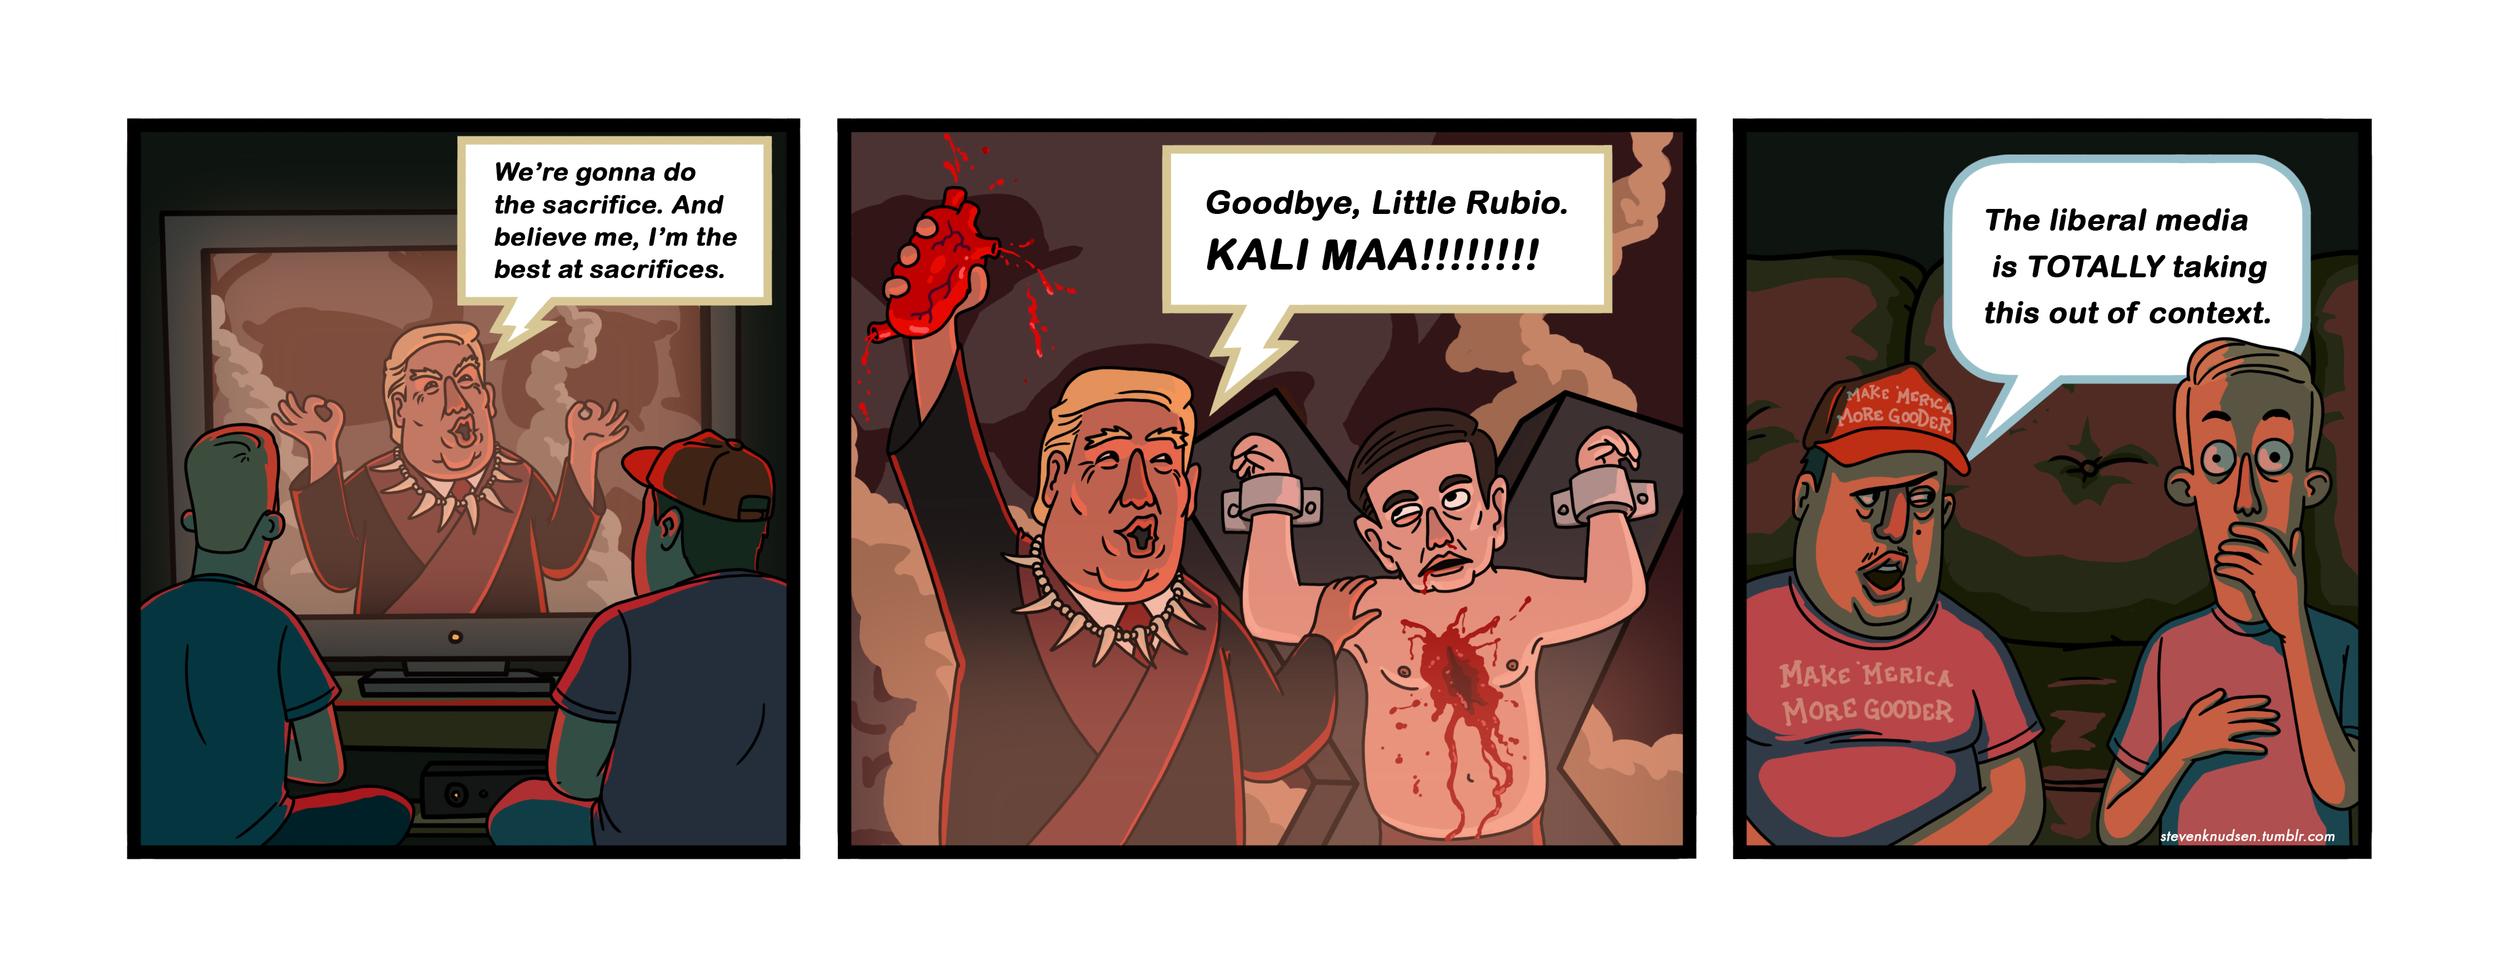 TrumpComic_01.jpg